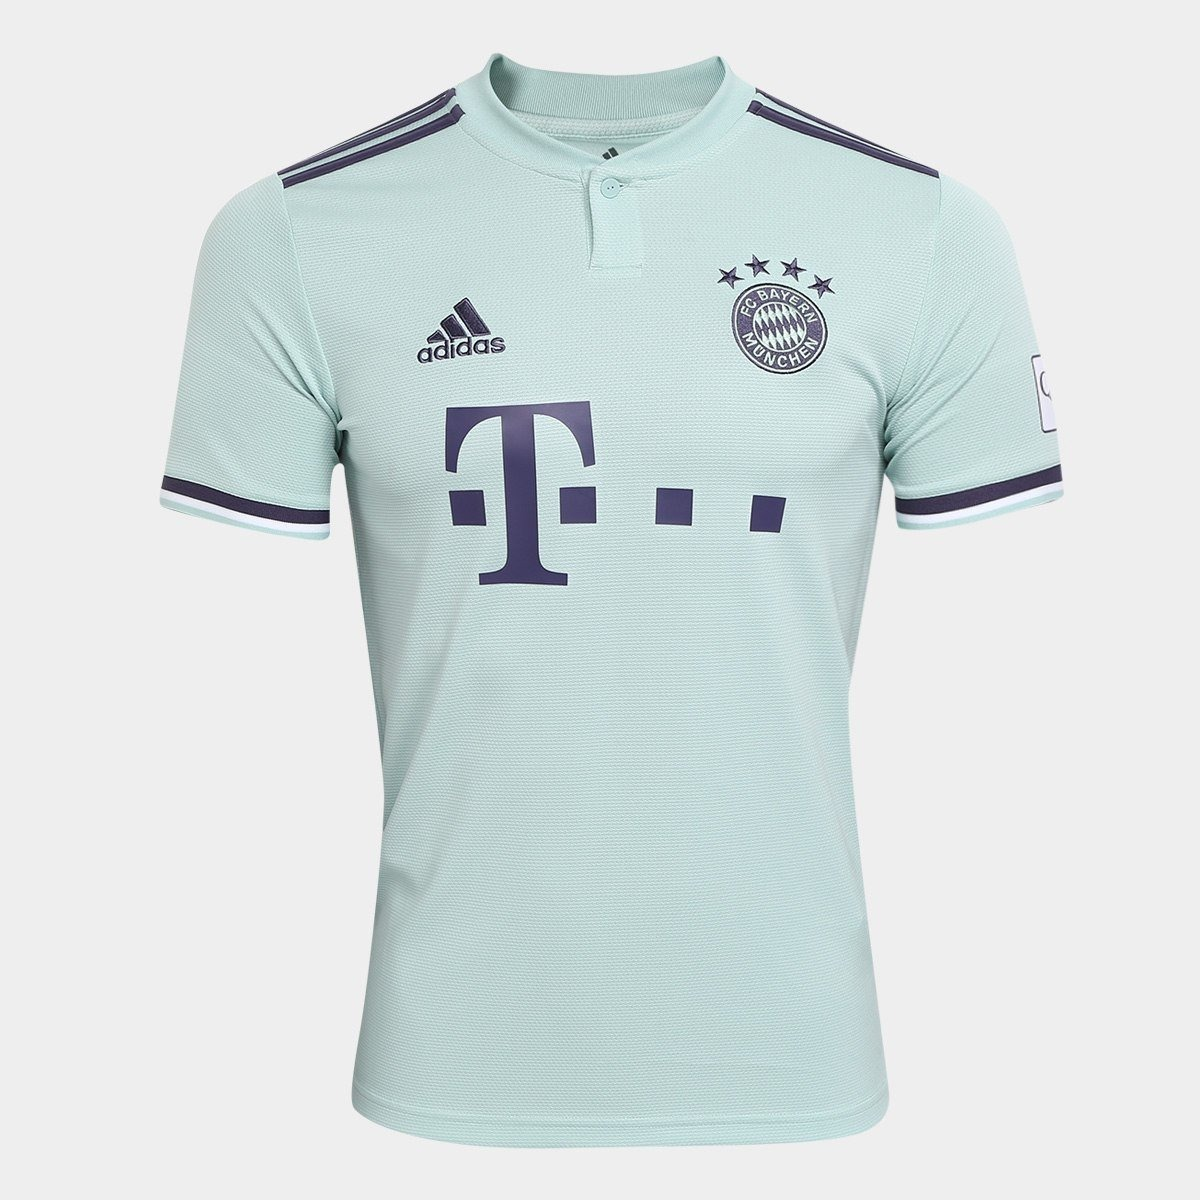 876d216358 Camisa Bayern Munich 2018 2019 Uniforme 2 Pronta Entrega - R  119